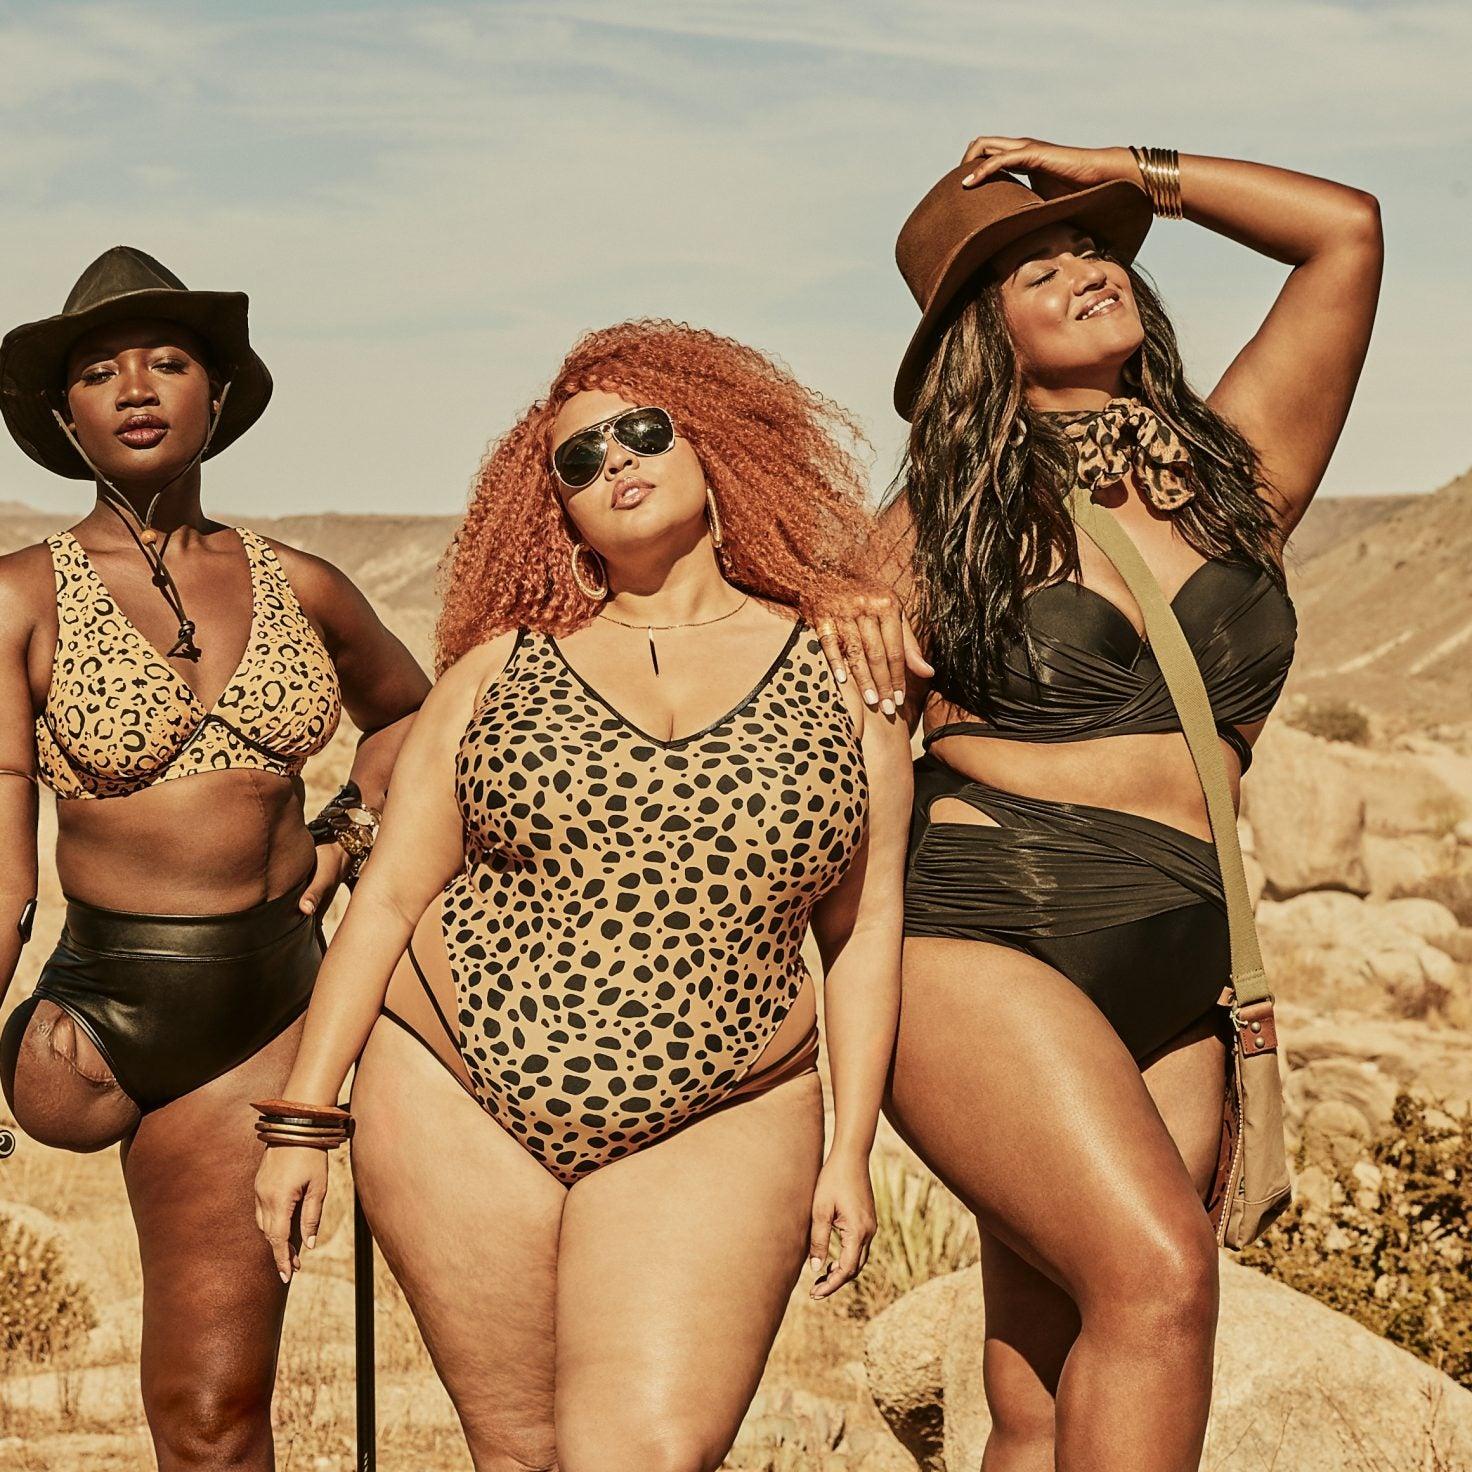 GabiFresh, Mama Cax and Veronica Pome'e Star in Swimsuits For All's Latest Campaign